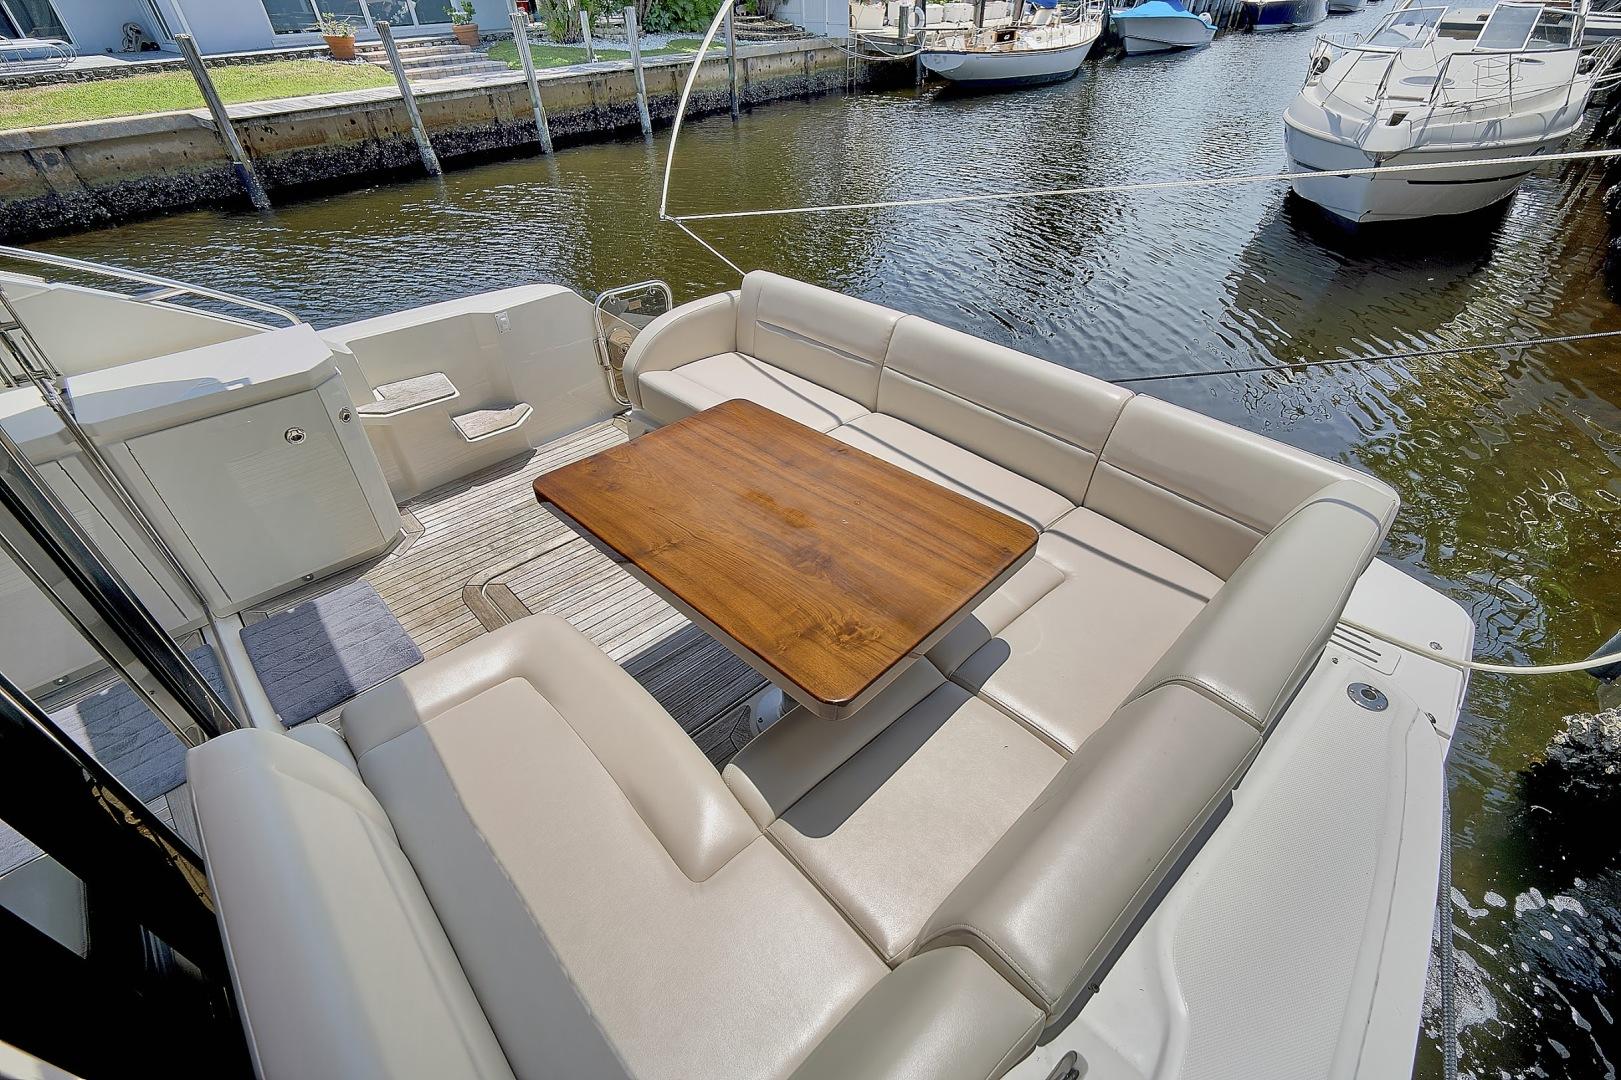 Sea Ray-Sundancer 2014-Lunasea Boca Raton-Florida-United States-1503186   Thumbnail